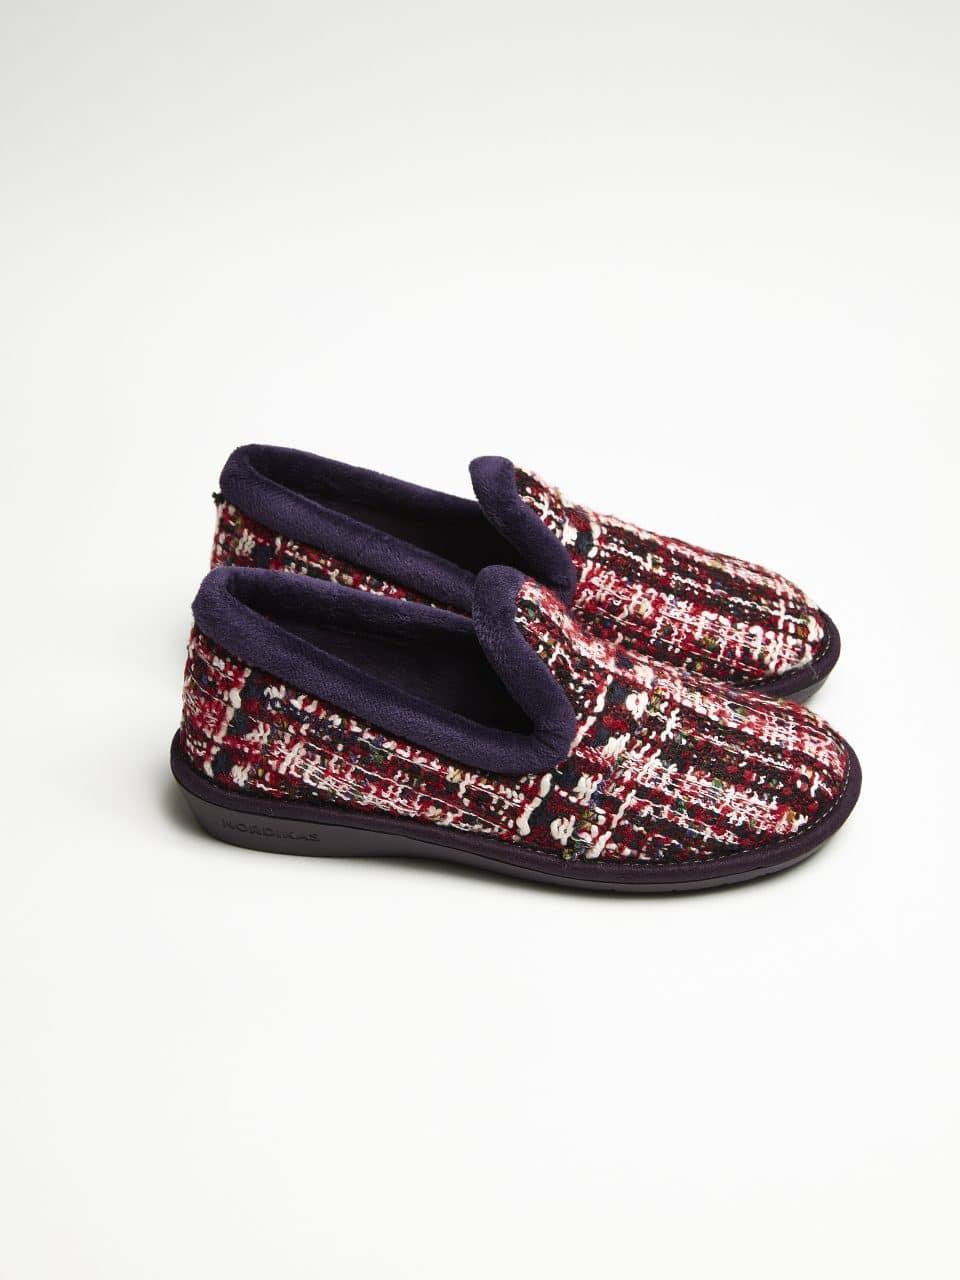 TRICOT ROJO Marcas en Loyna Shoes